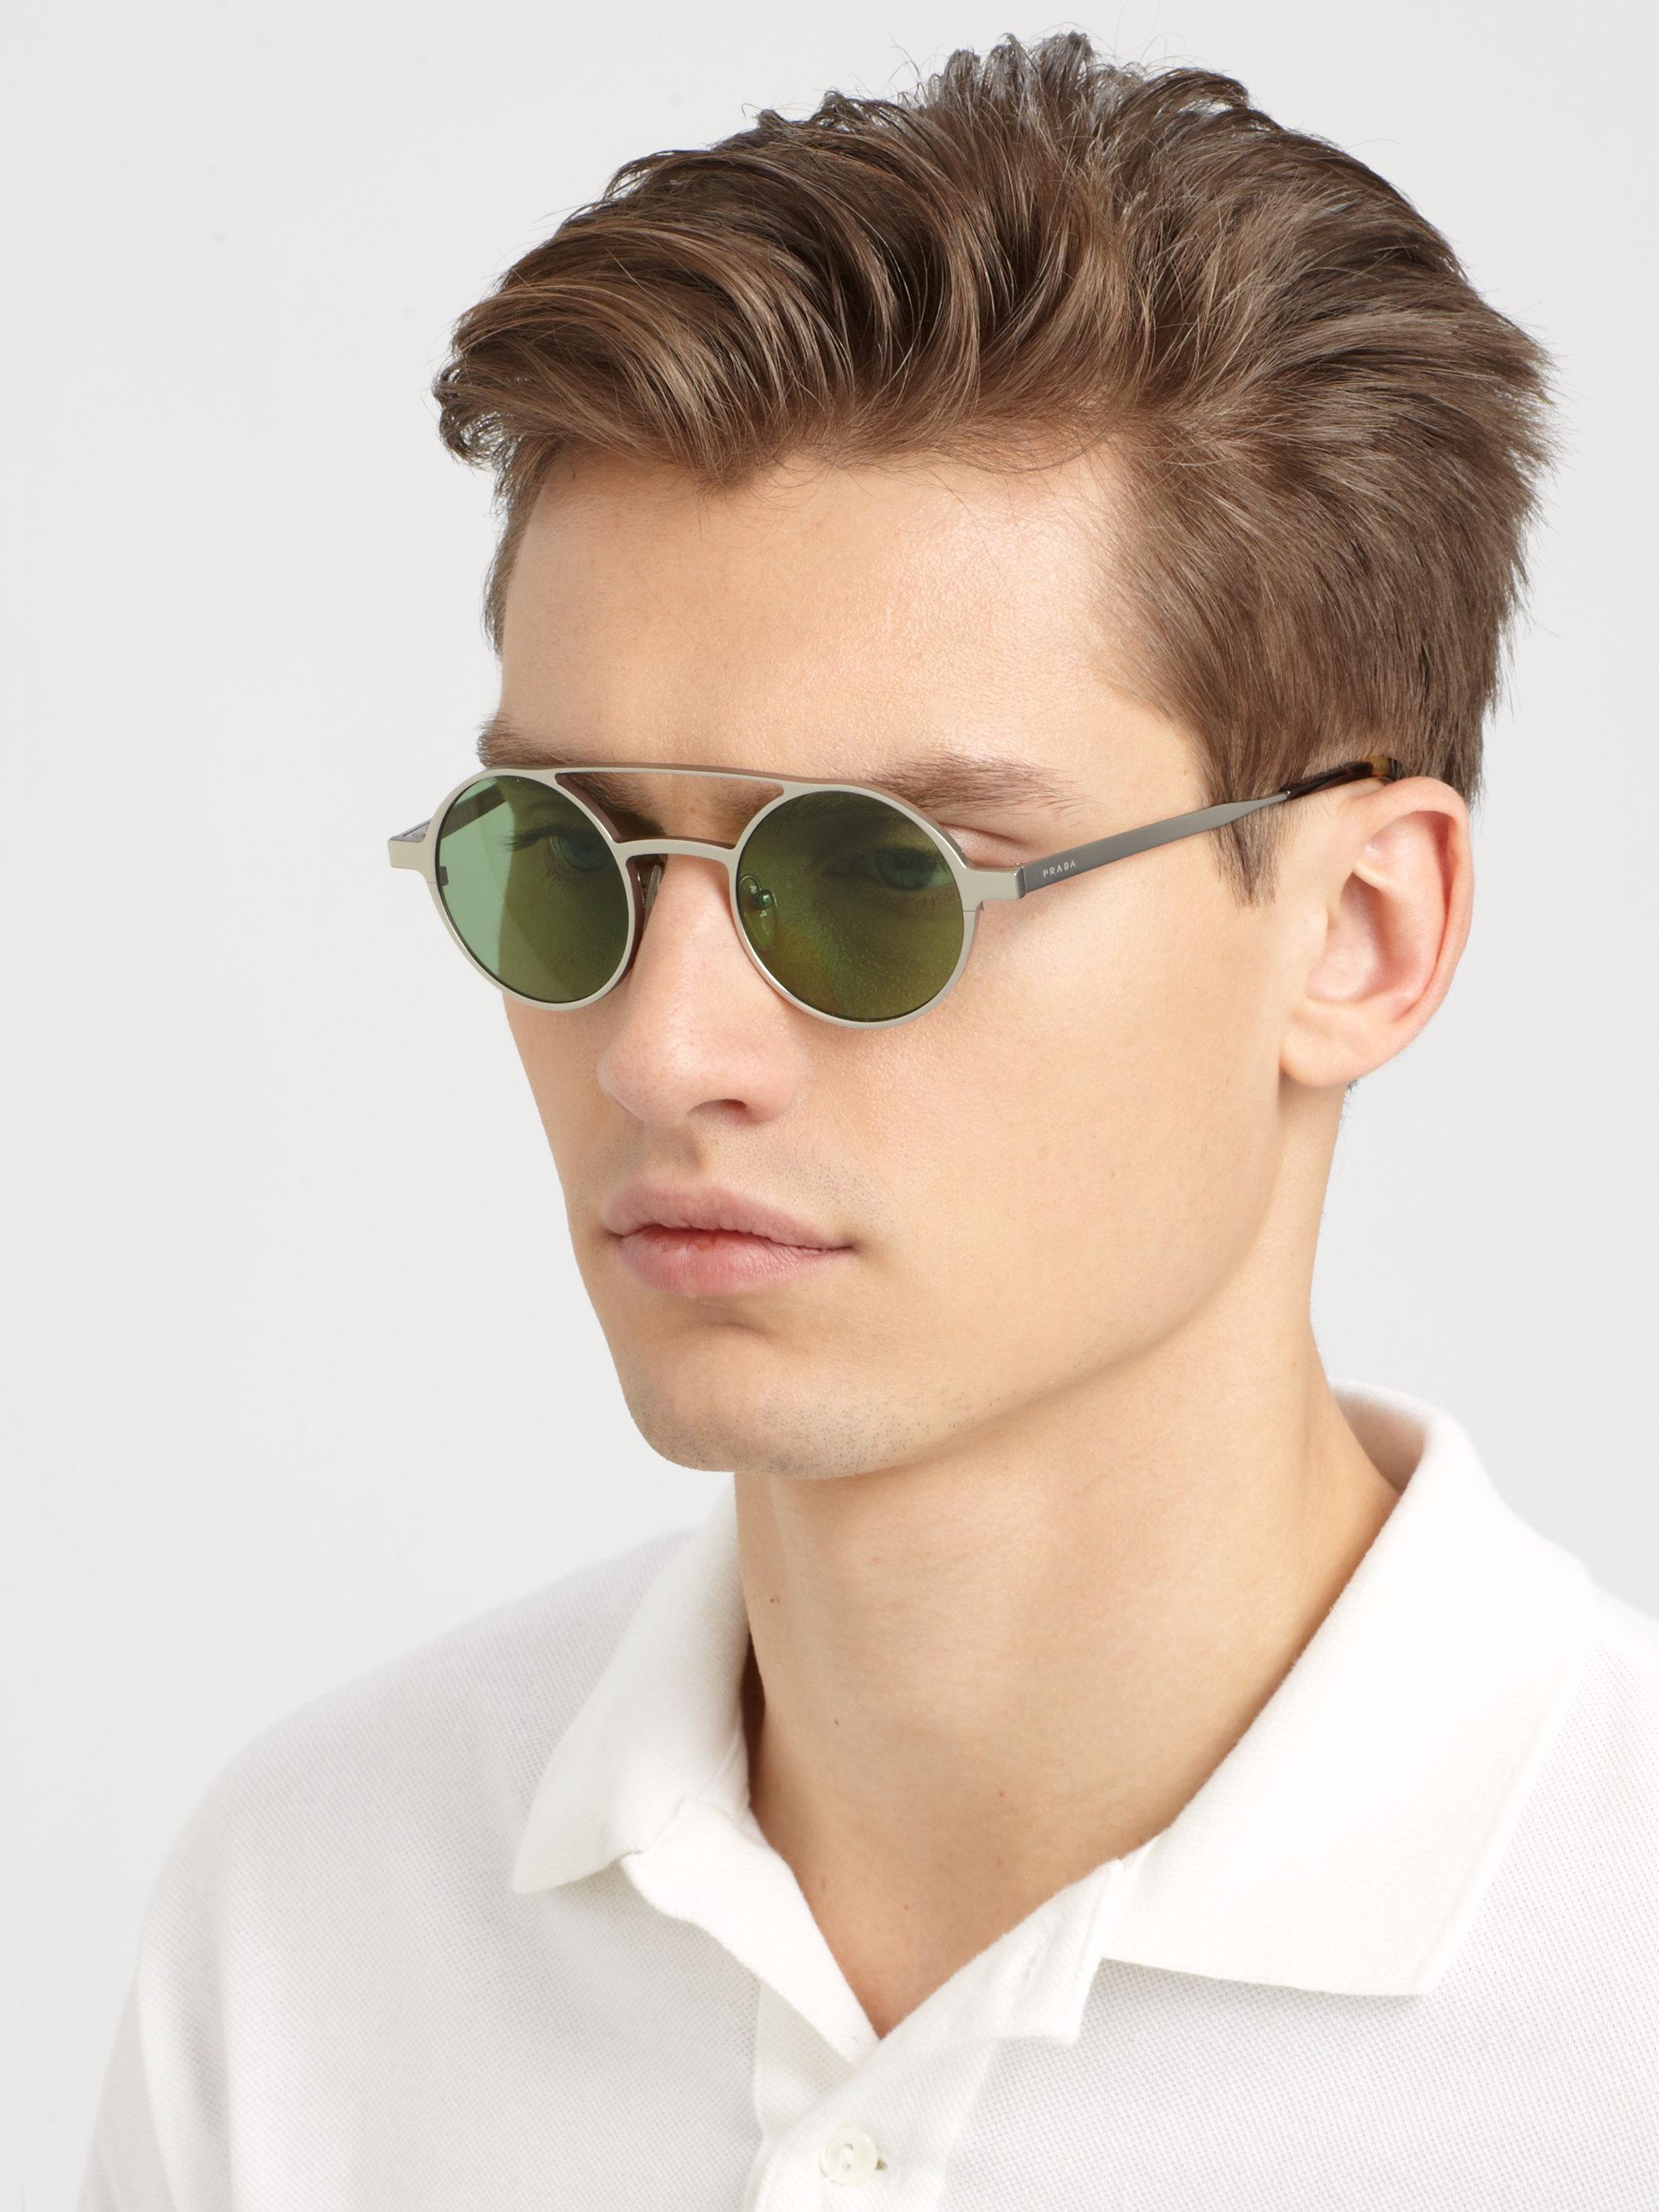 Men S Health Subscription Plus: Men's Eyeglasses Trends 2016